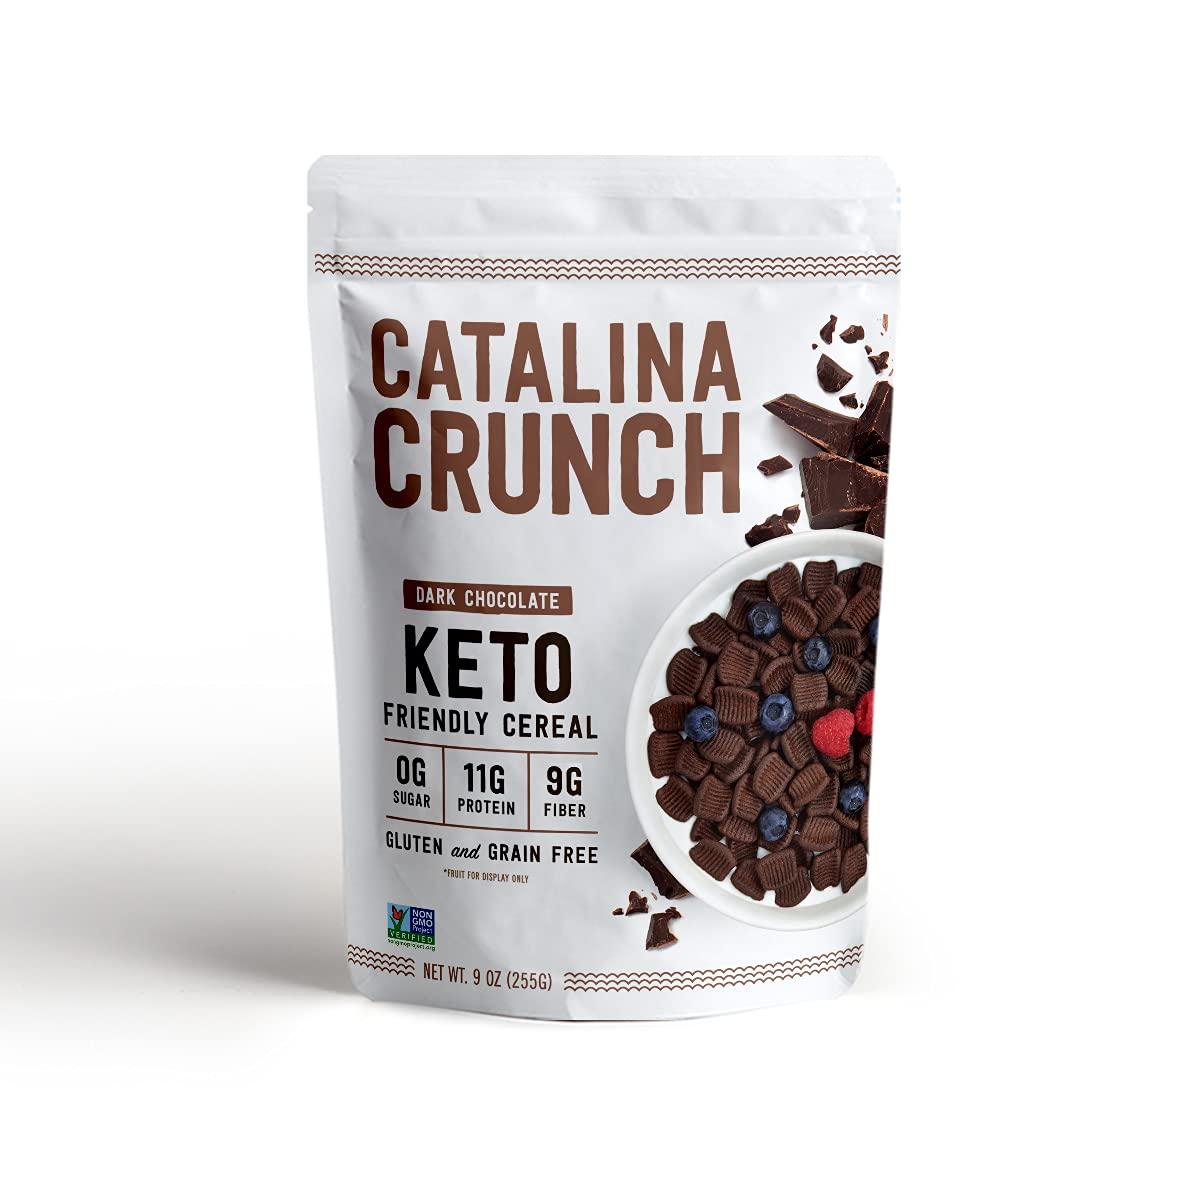 Catalina Crunch Dark Chocolate Keto Cereal (9oz Bags) | Low Carb, Sugar Free, Gluten Free, Grain Free | Keto Snacks, Vegan, Plant Based | Breakfast Cereals | Keto Friendly Food